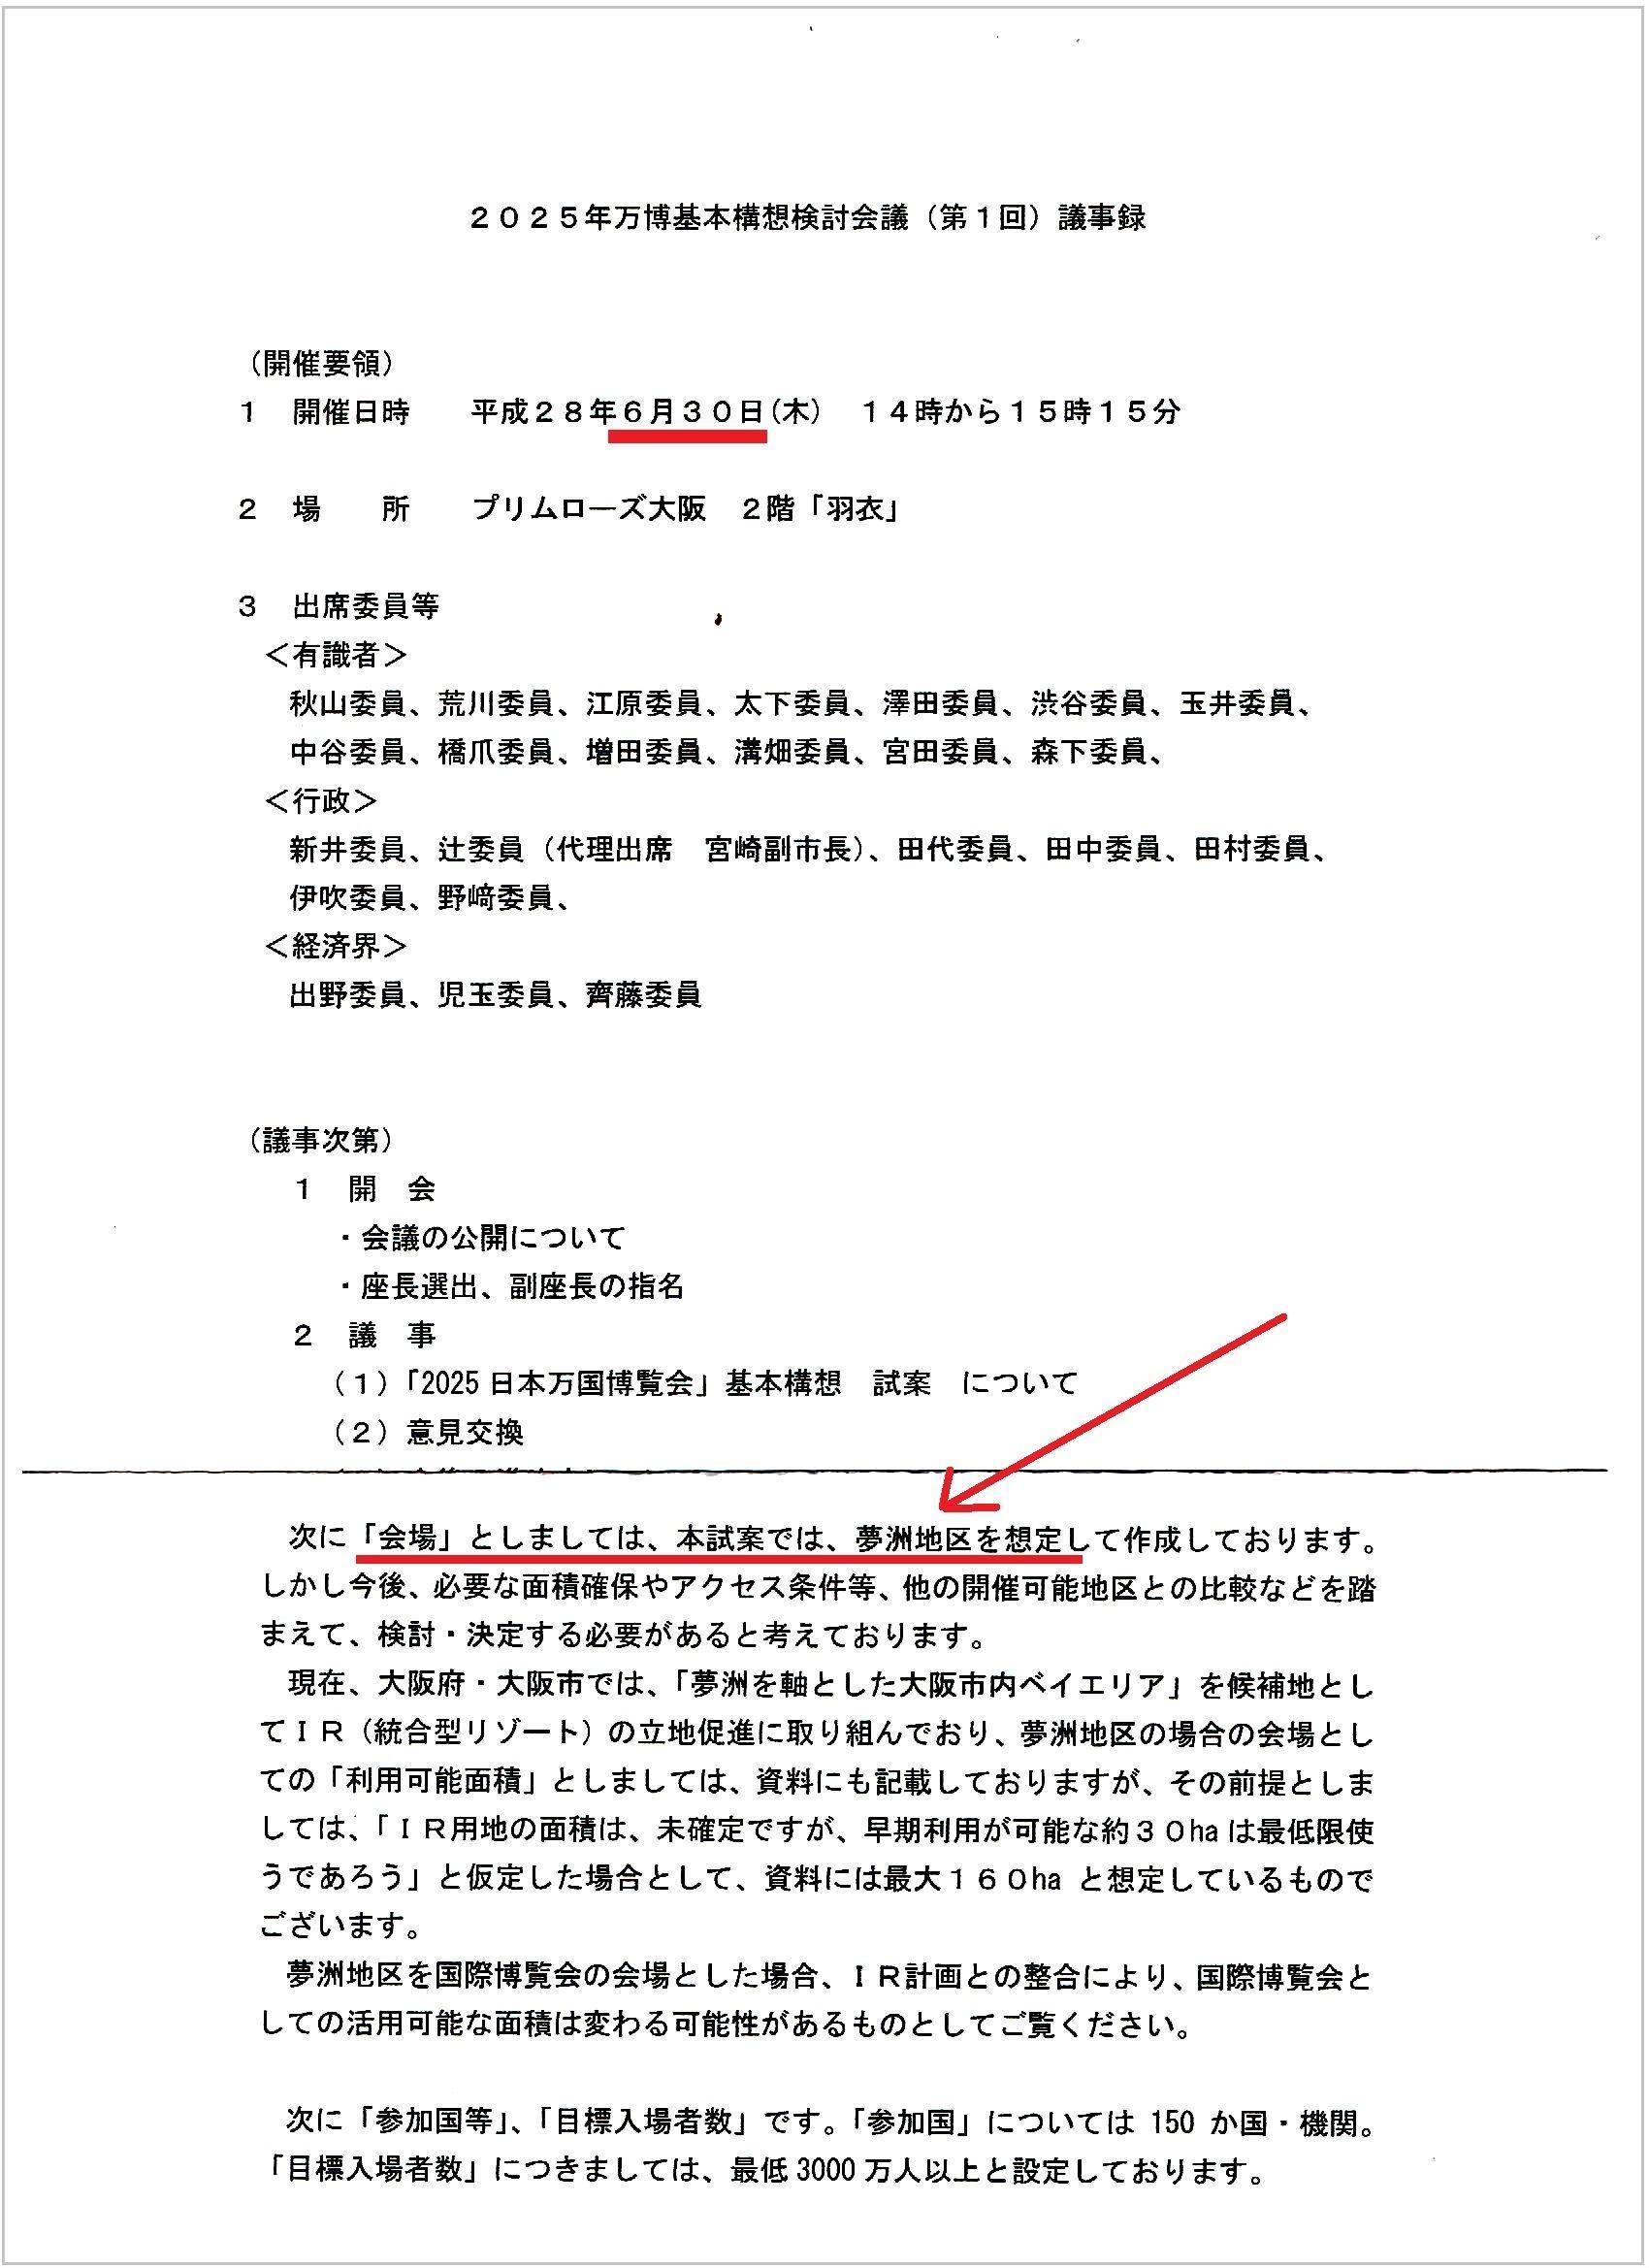 http://hunter-investigate.jp/news/e71b971d1cf97c0b5bb099b9074f5238f2143777.jpg